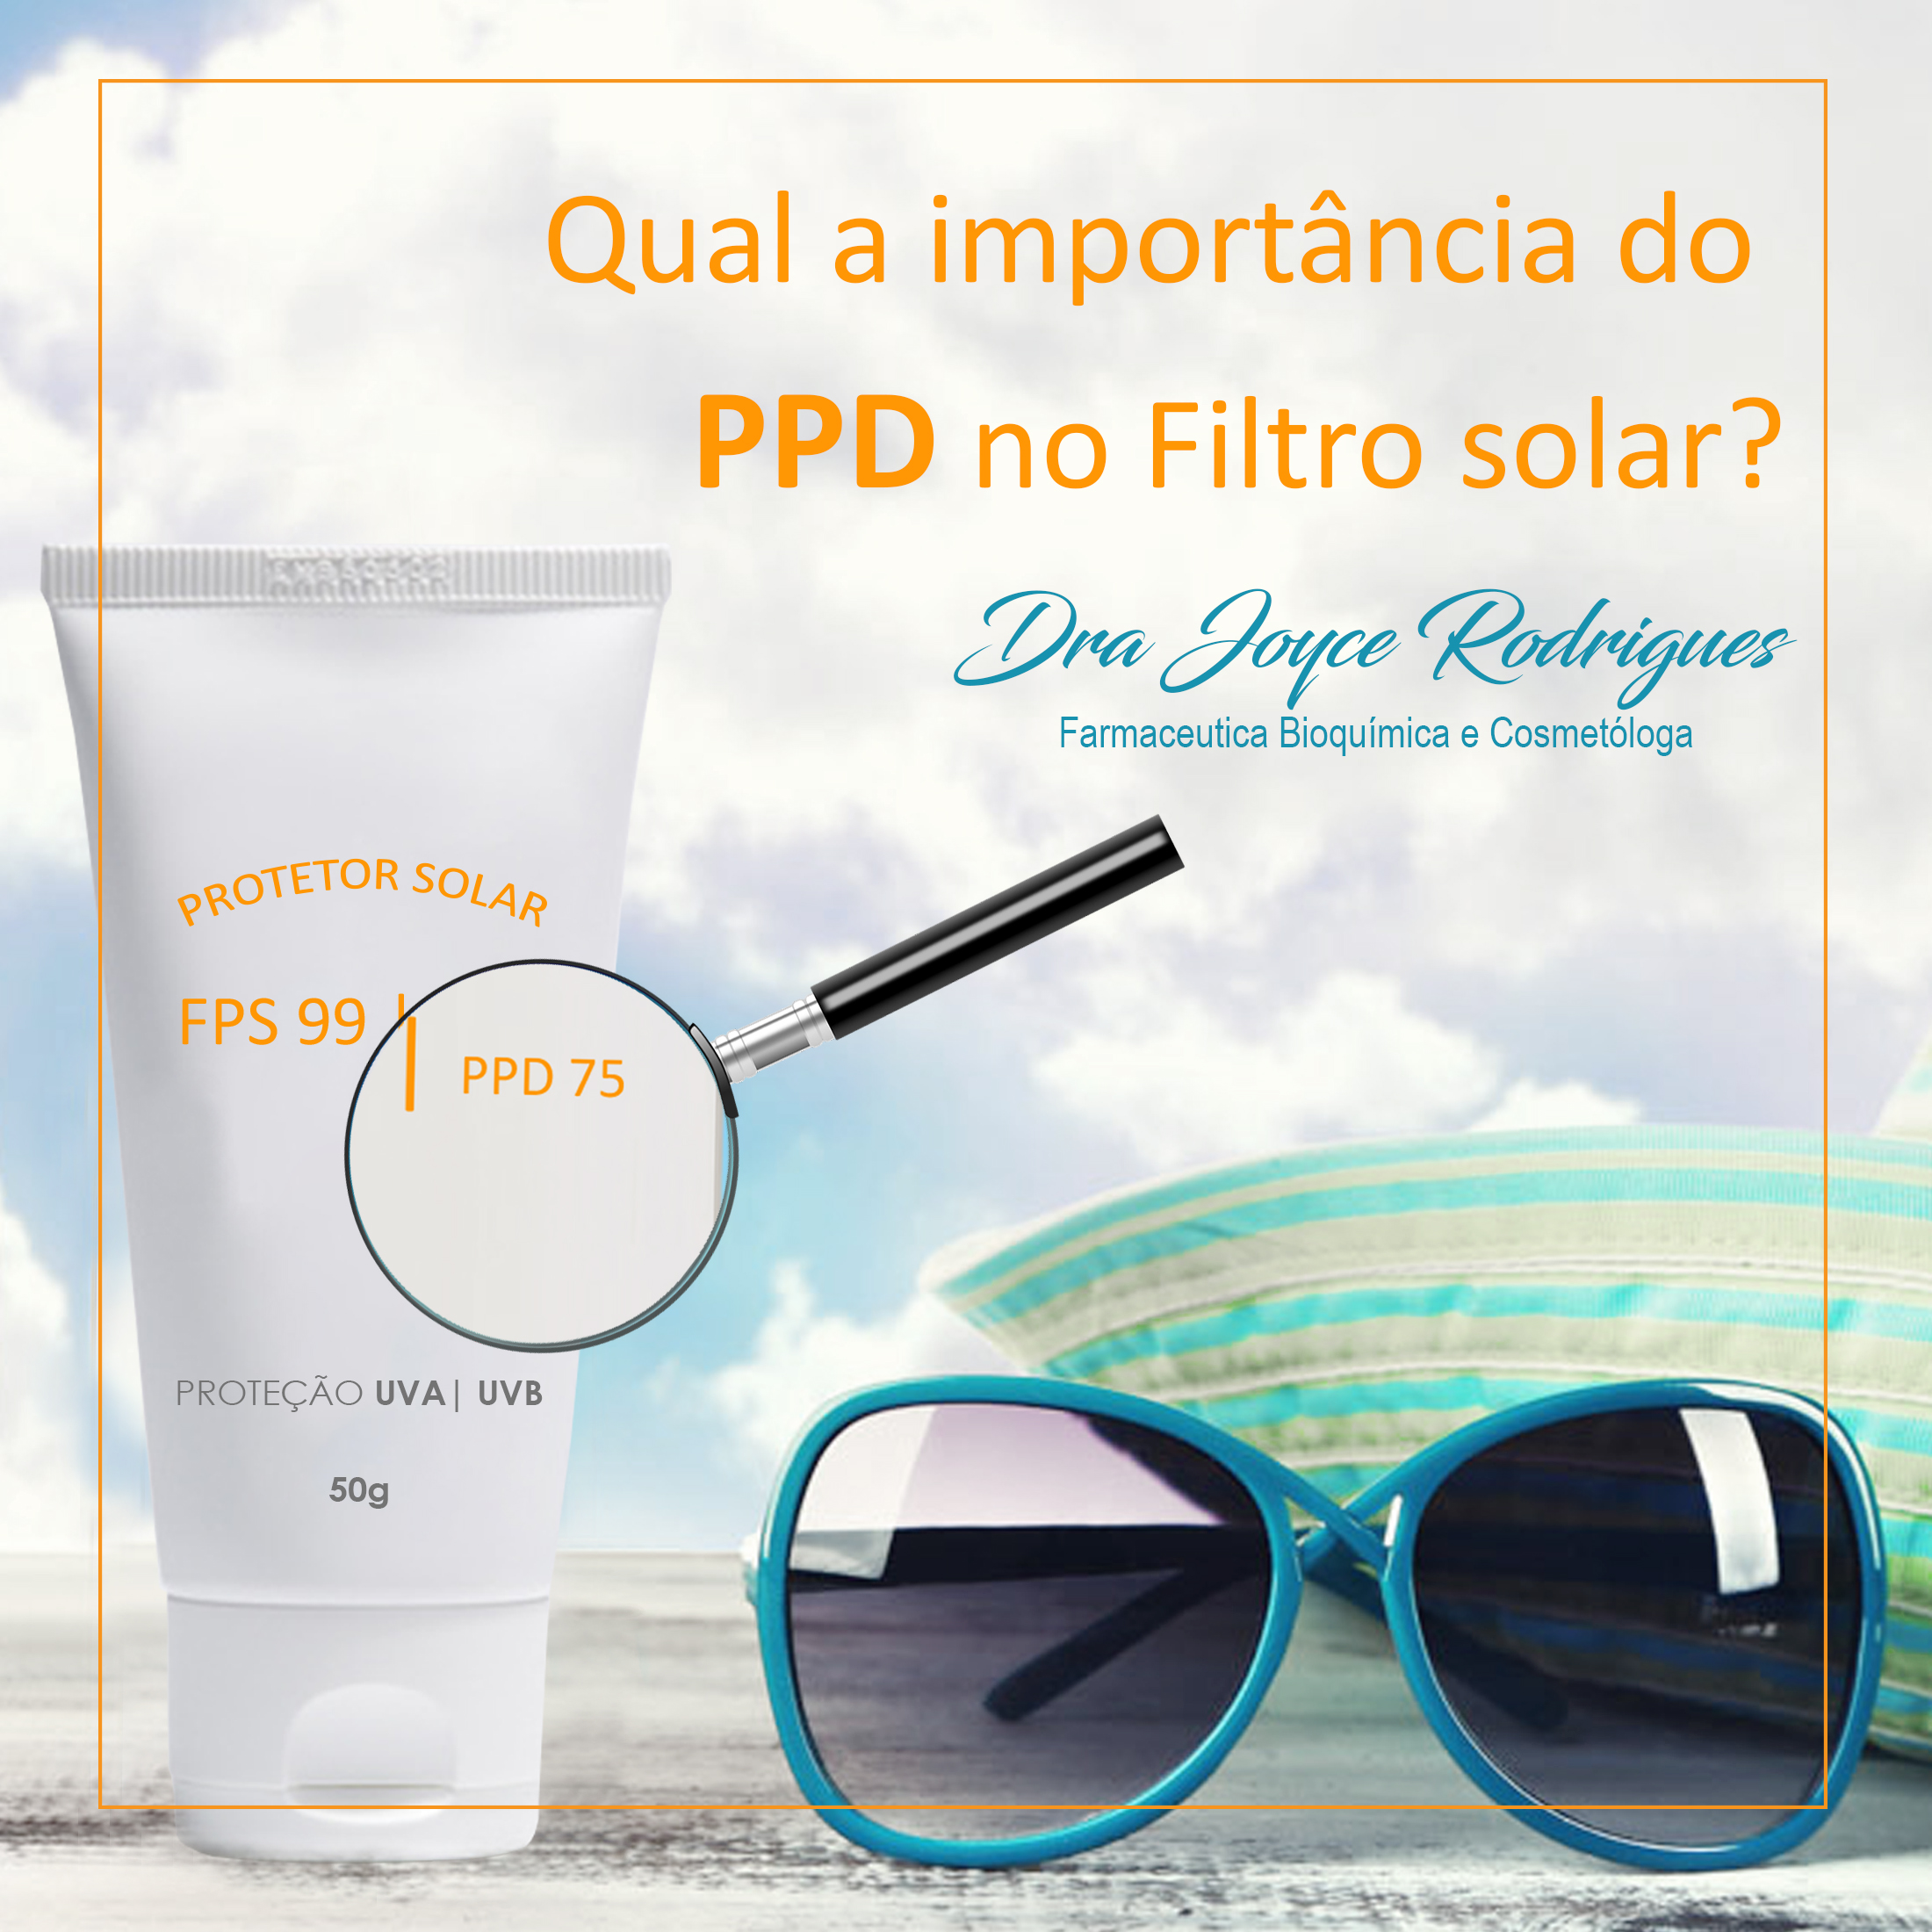 Qual a importância do PPD no filtro?